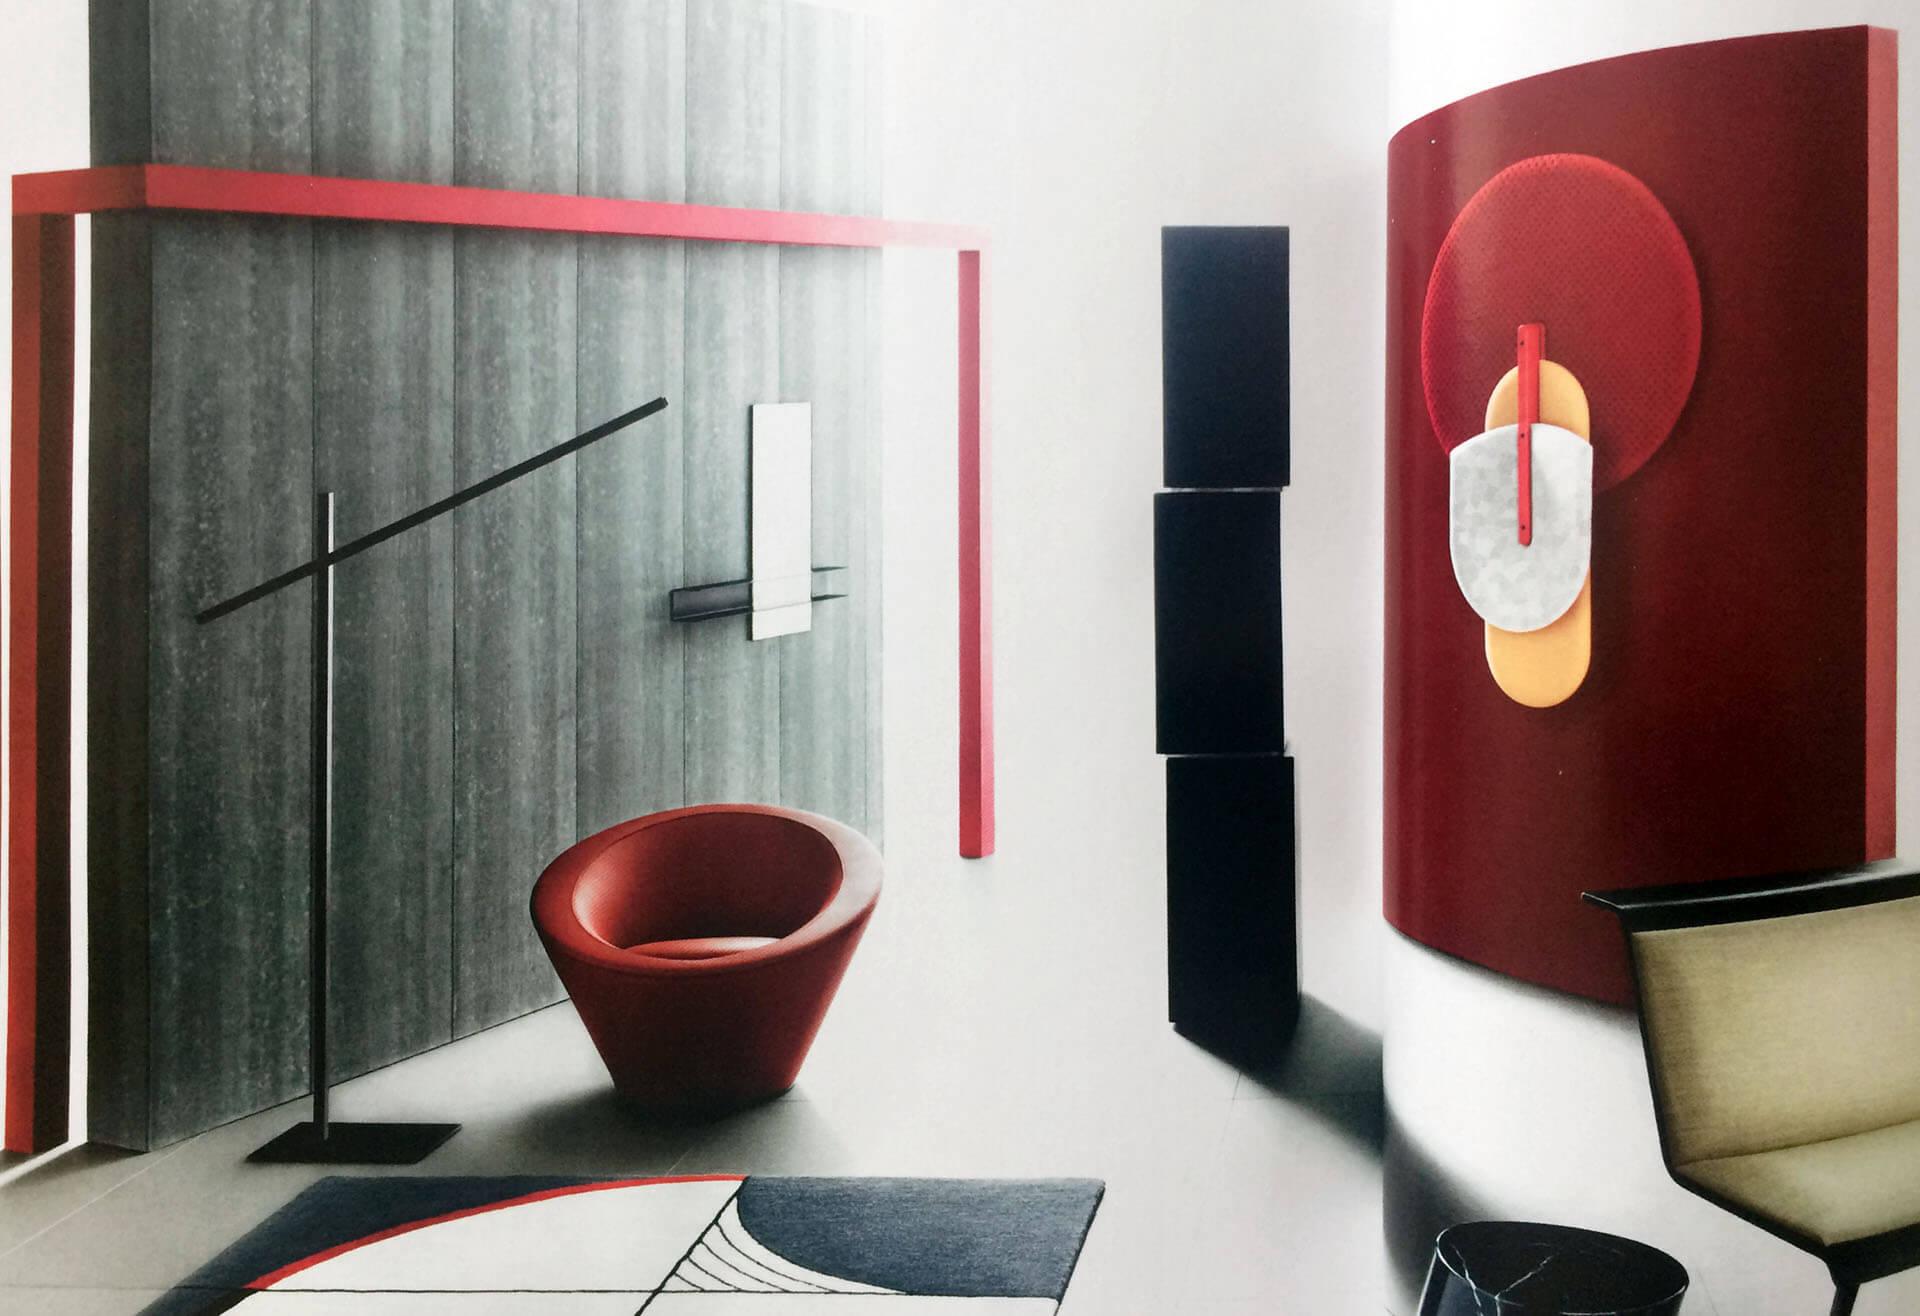 Slide Mirror Double In Wallpaper